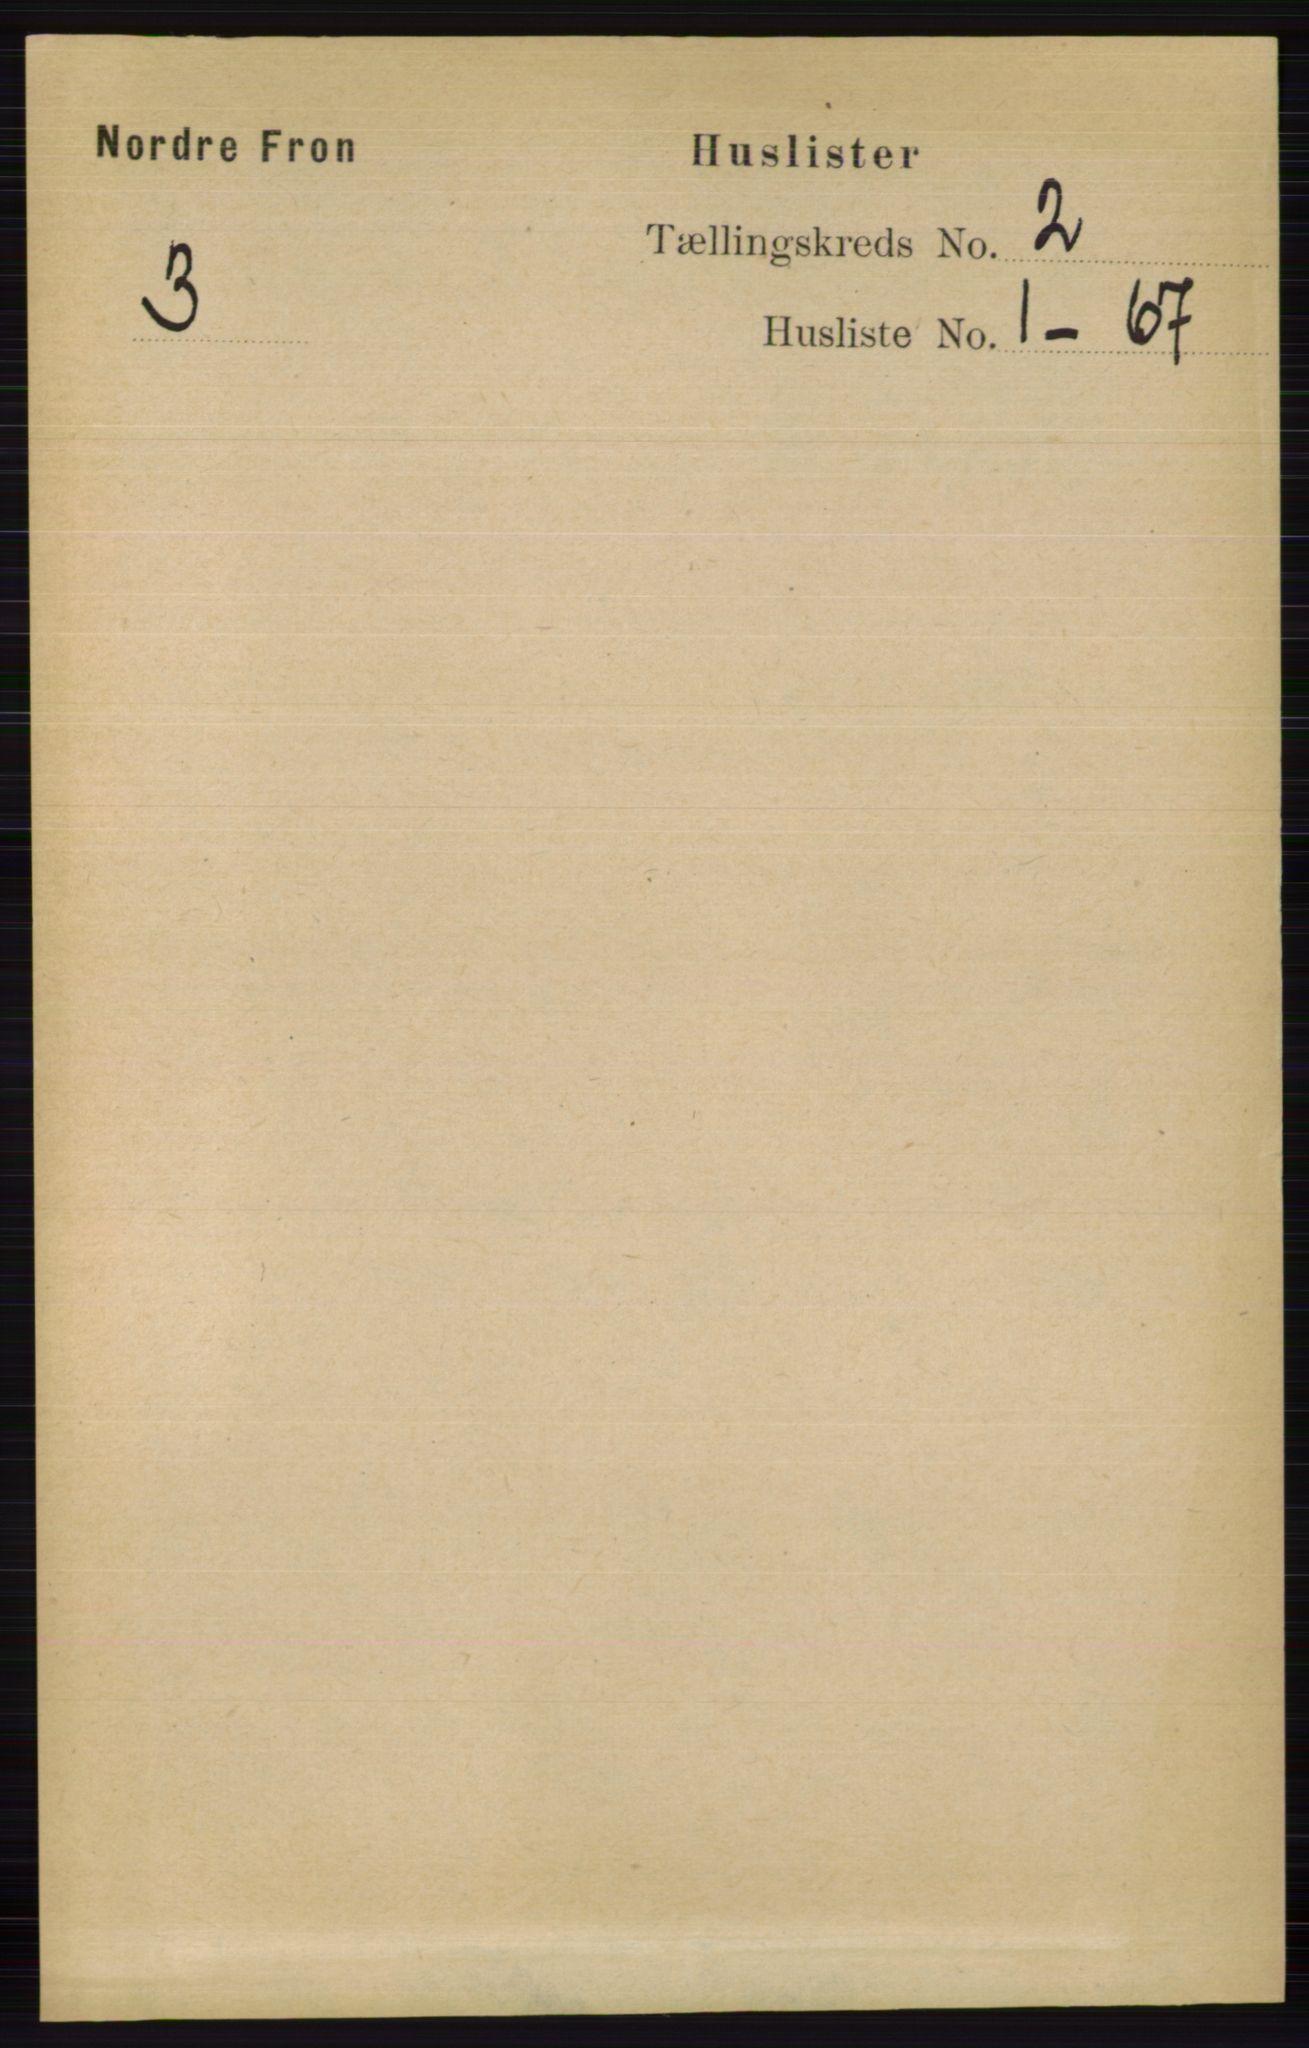 RA, Folketelling 1891 for 0518 Nord-Fron herred, 1891, s. 271